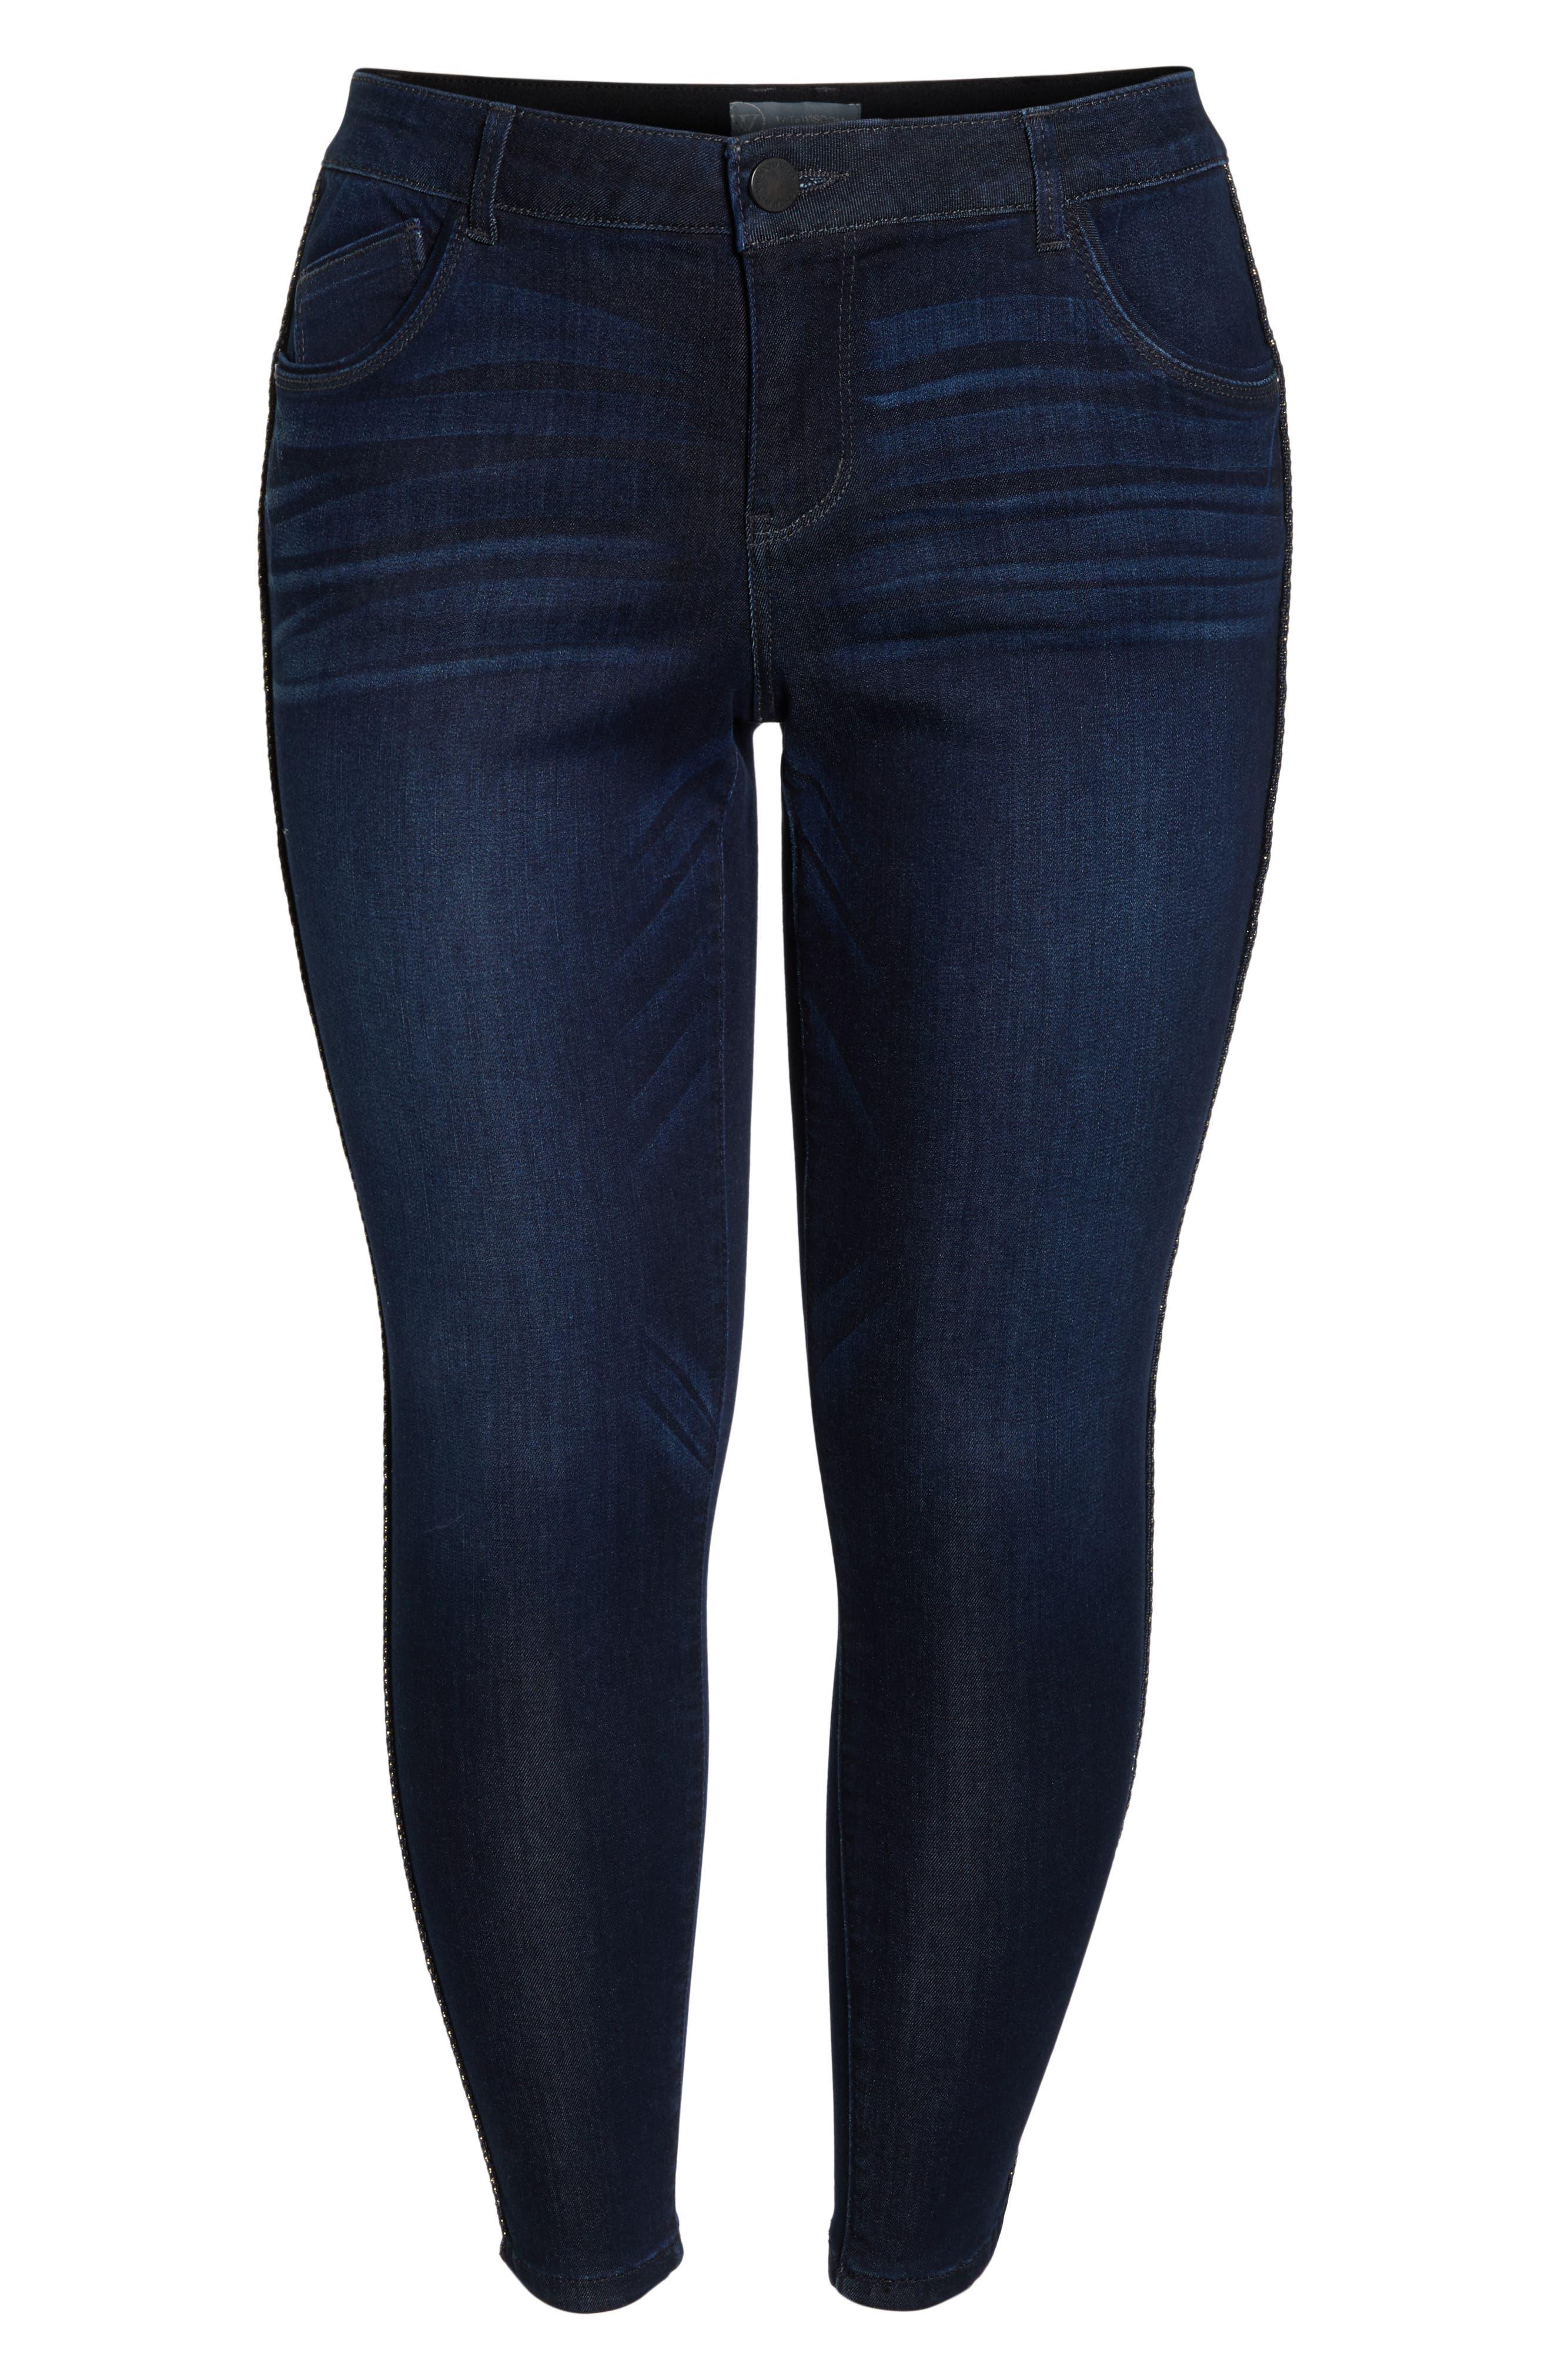 Ab-Solution Side Trim Ankle Jeans,                             Alternate thumbnail 7, color,                             INDIGO